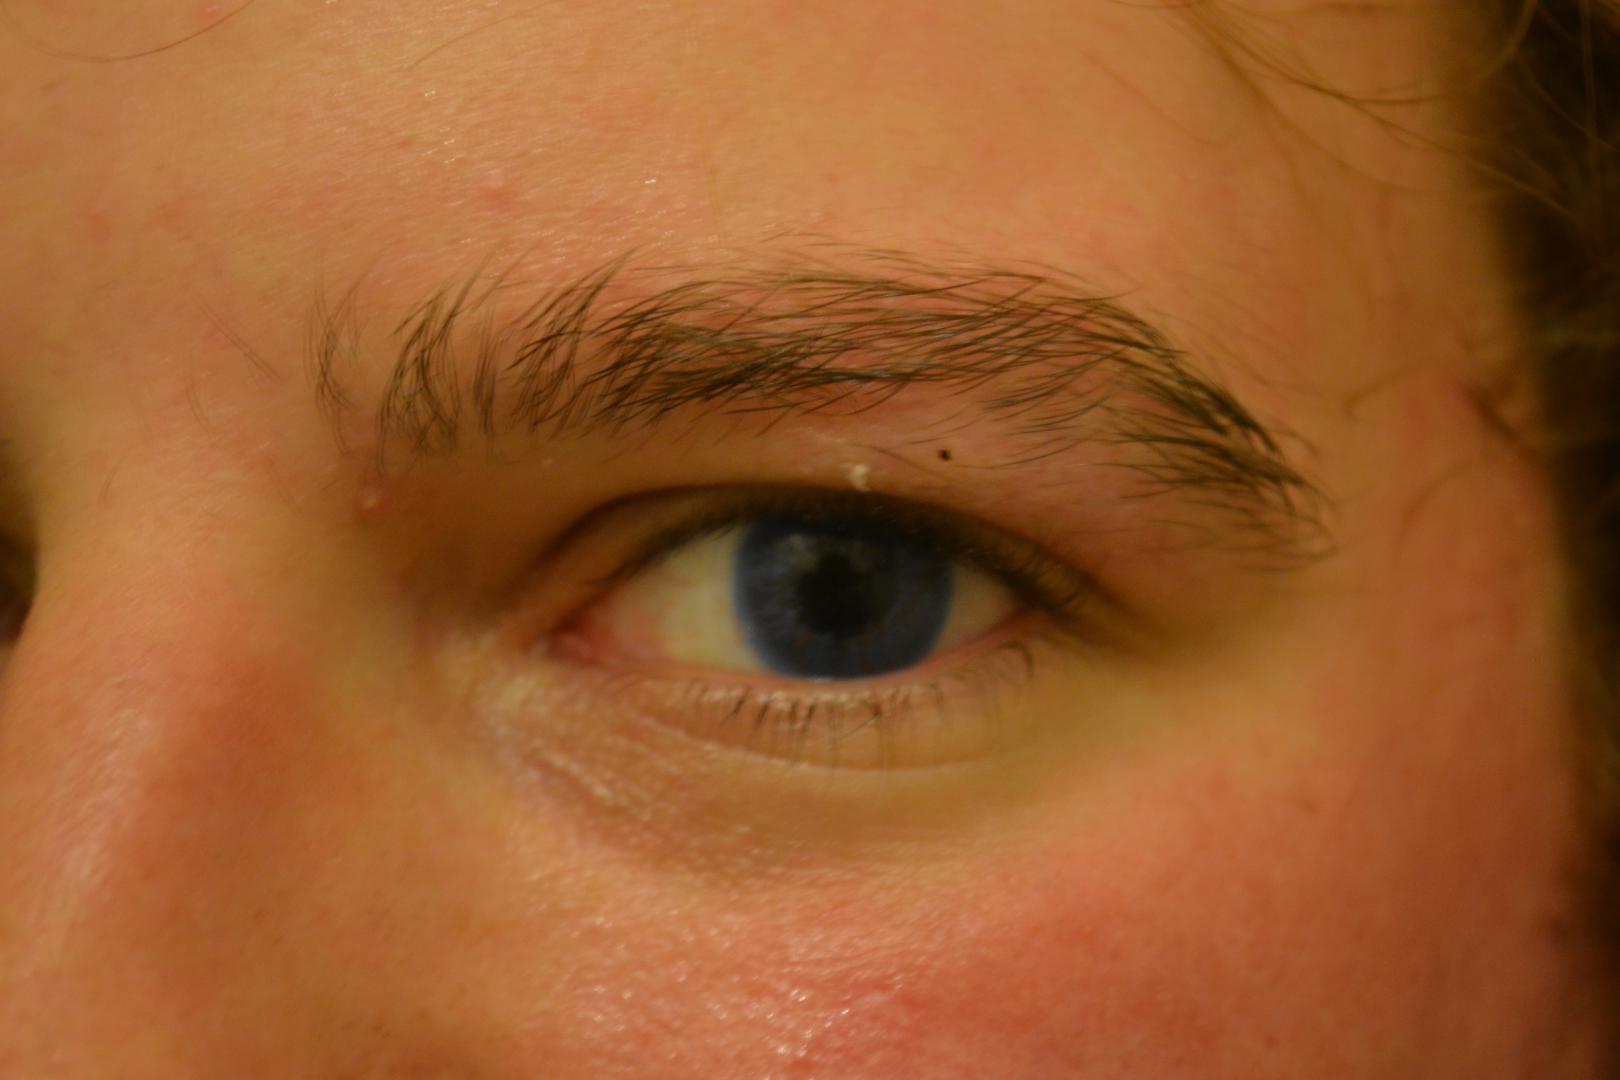 Thor's eyes